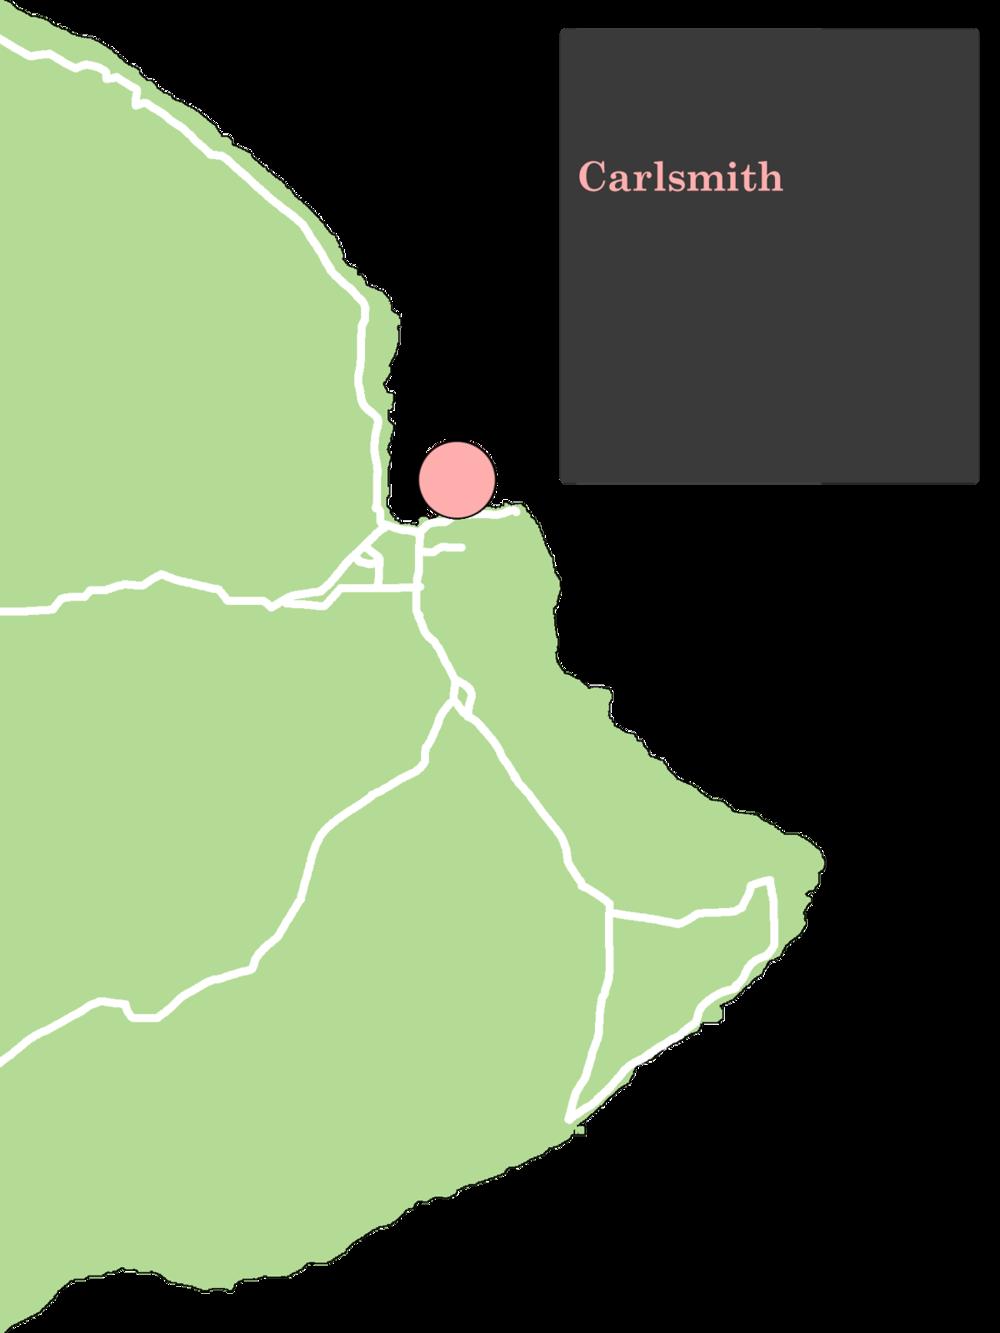 CarlsmithHiloMap.png